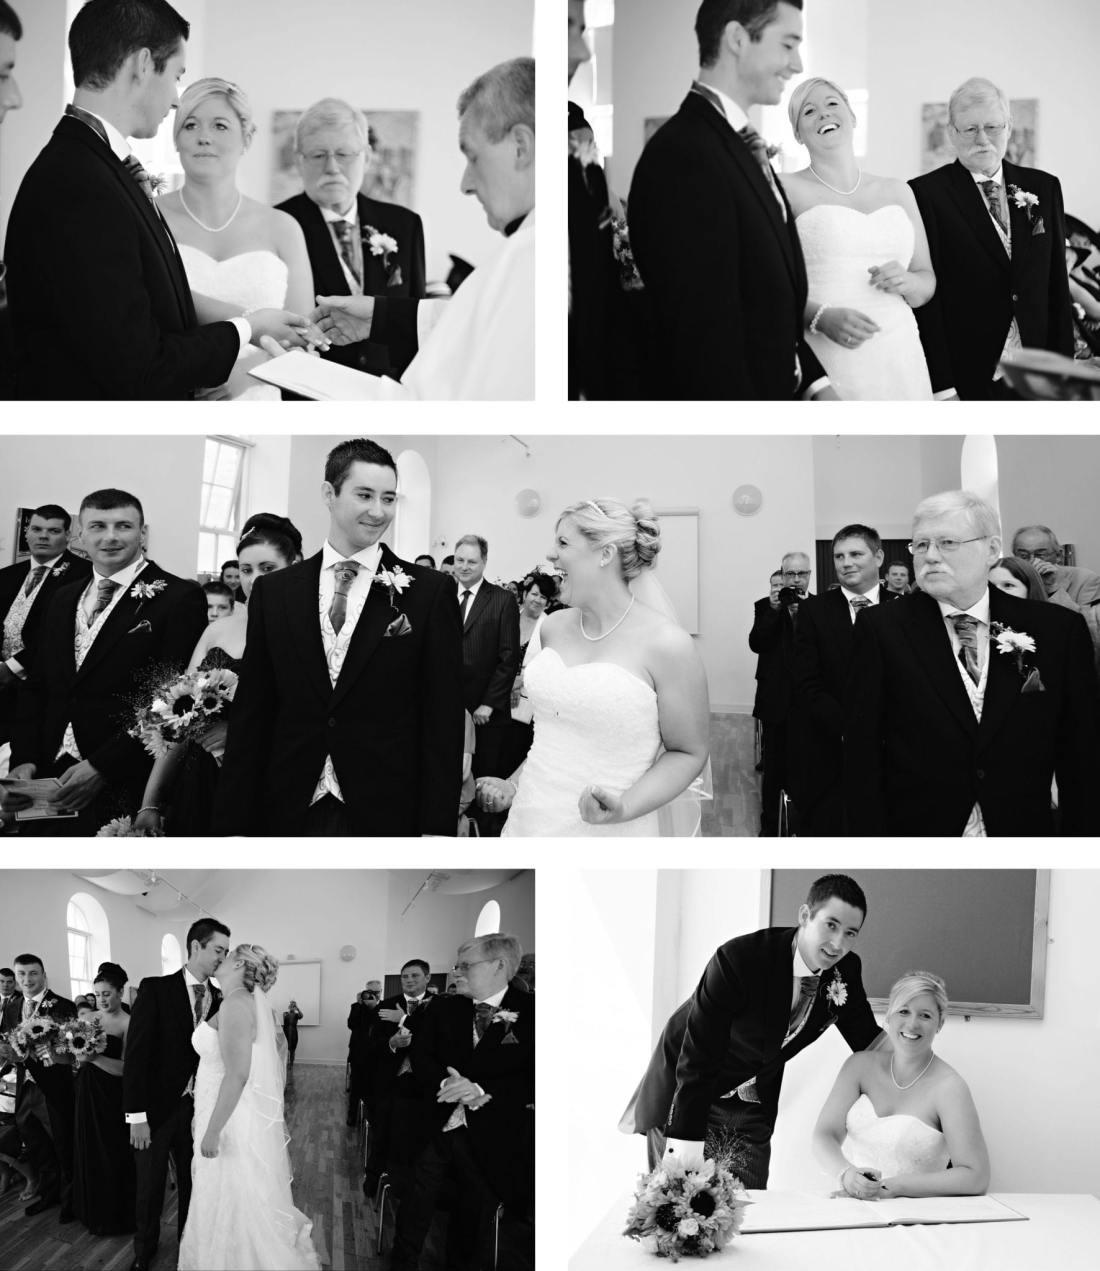 North Wales wedding - bride celebrating